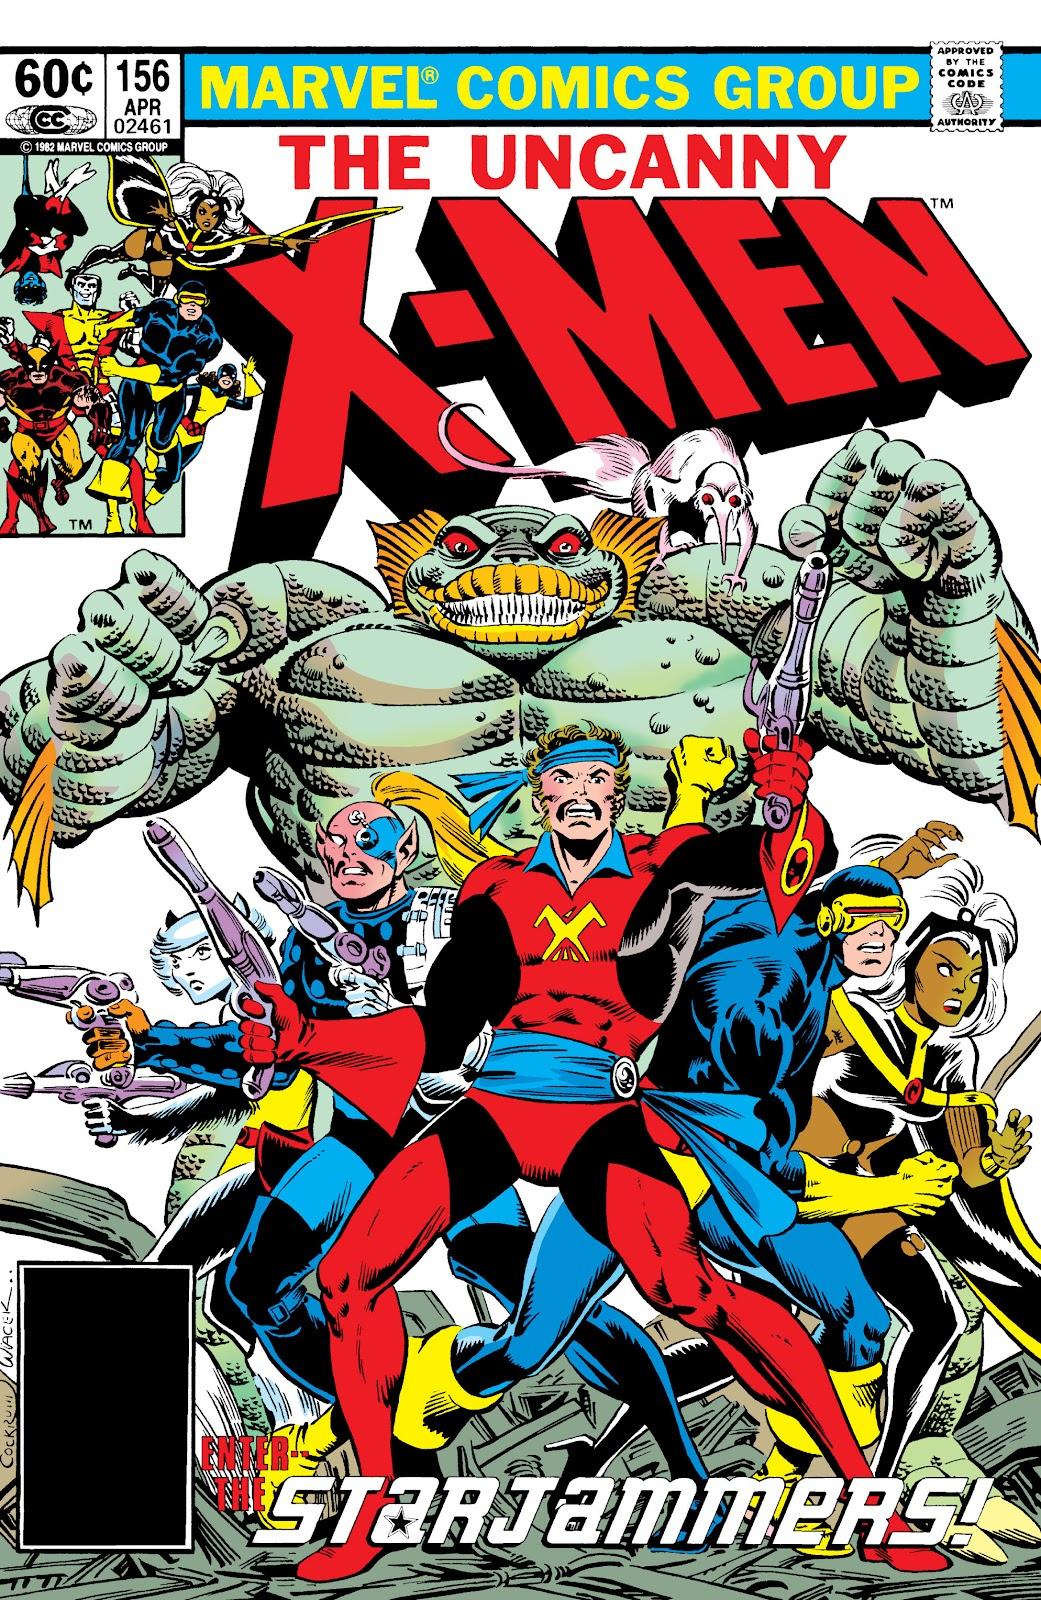 Uncanny X-Men (1963) issue 156 - Page 1